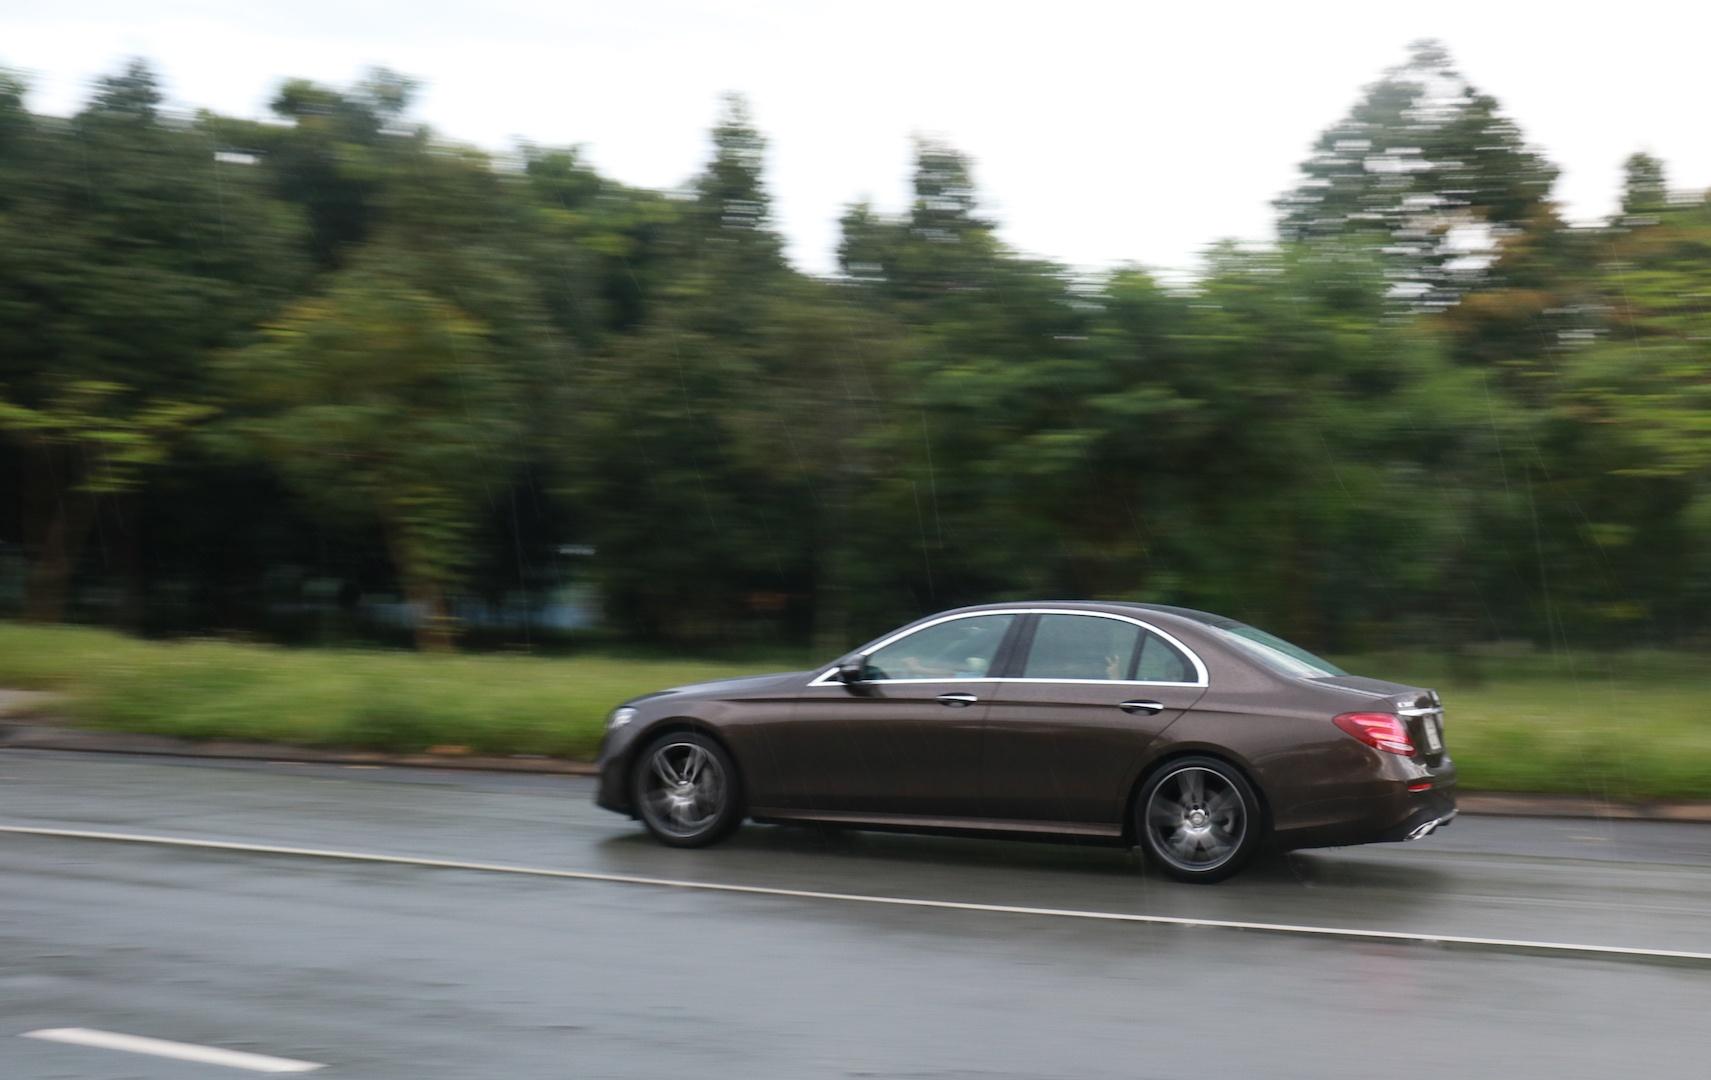 Danh gia Mercedes E300 AMG tai Viet Nam anh 3